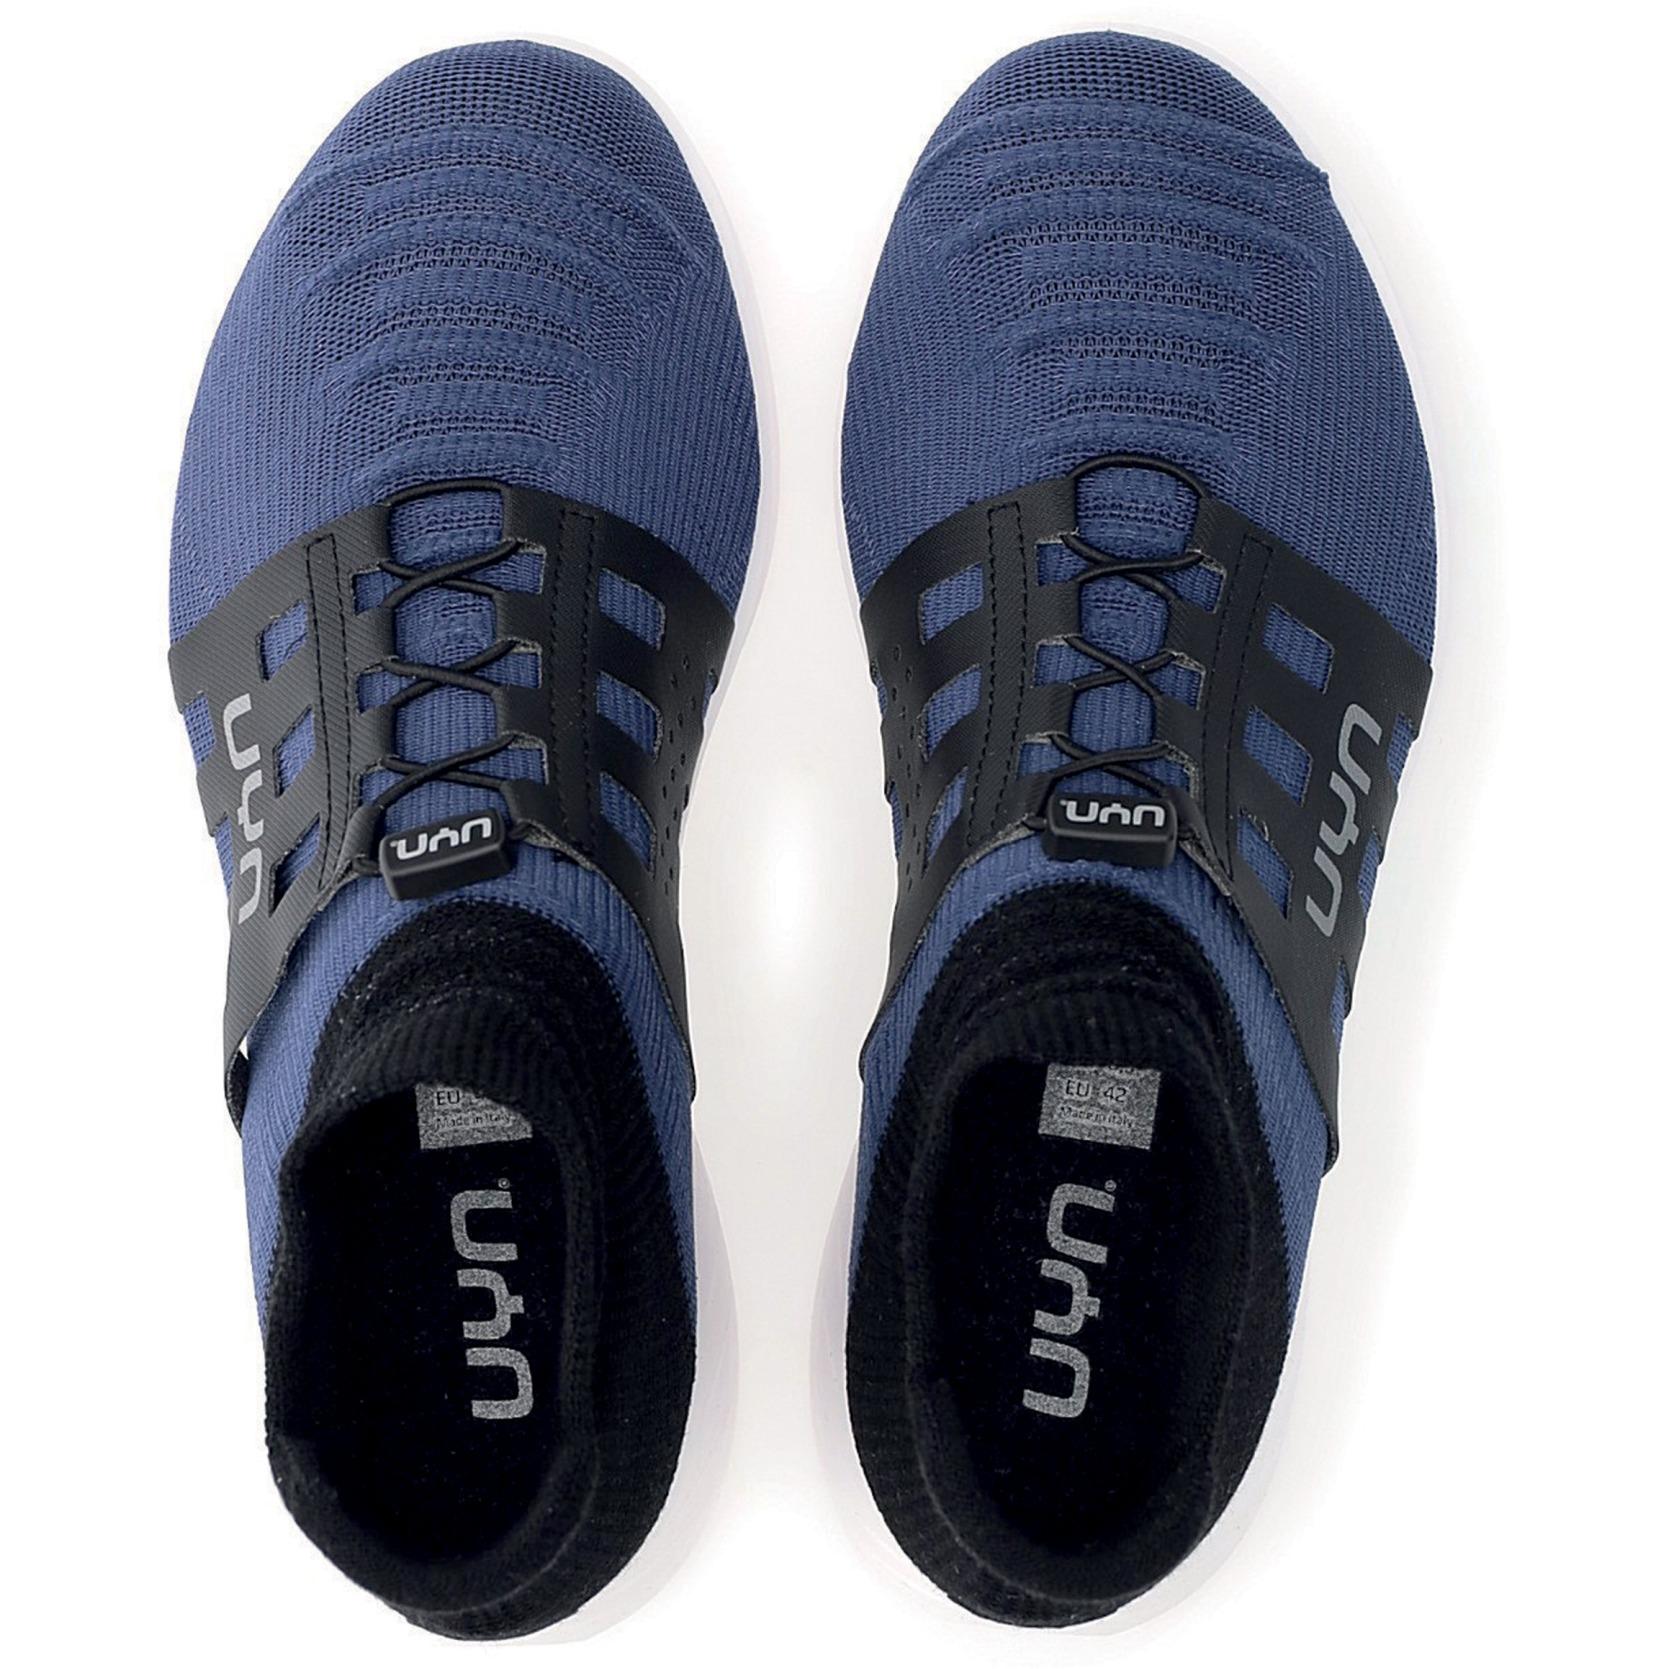 Image of UYN X-Cross Tune Running Shoes - Midnight Blue